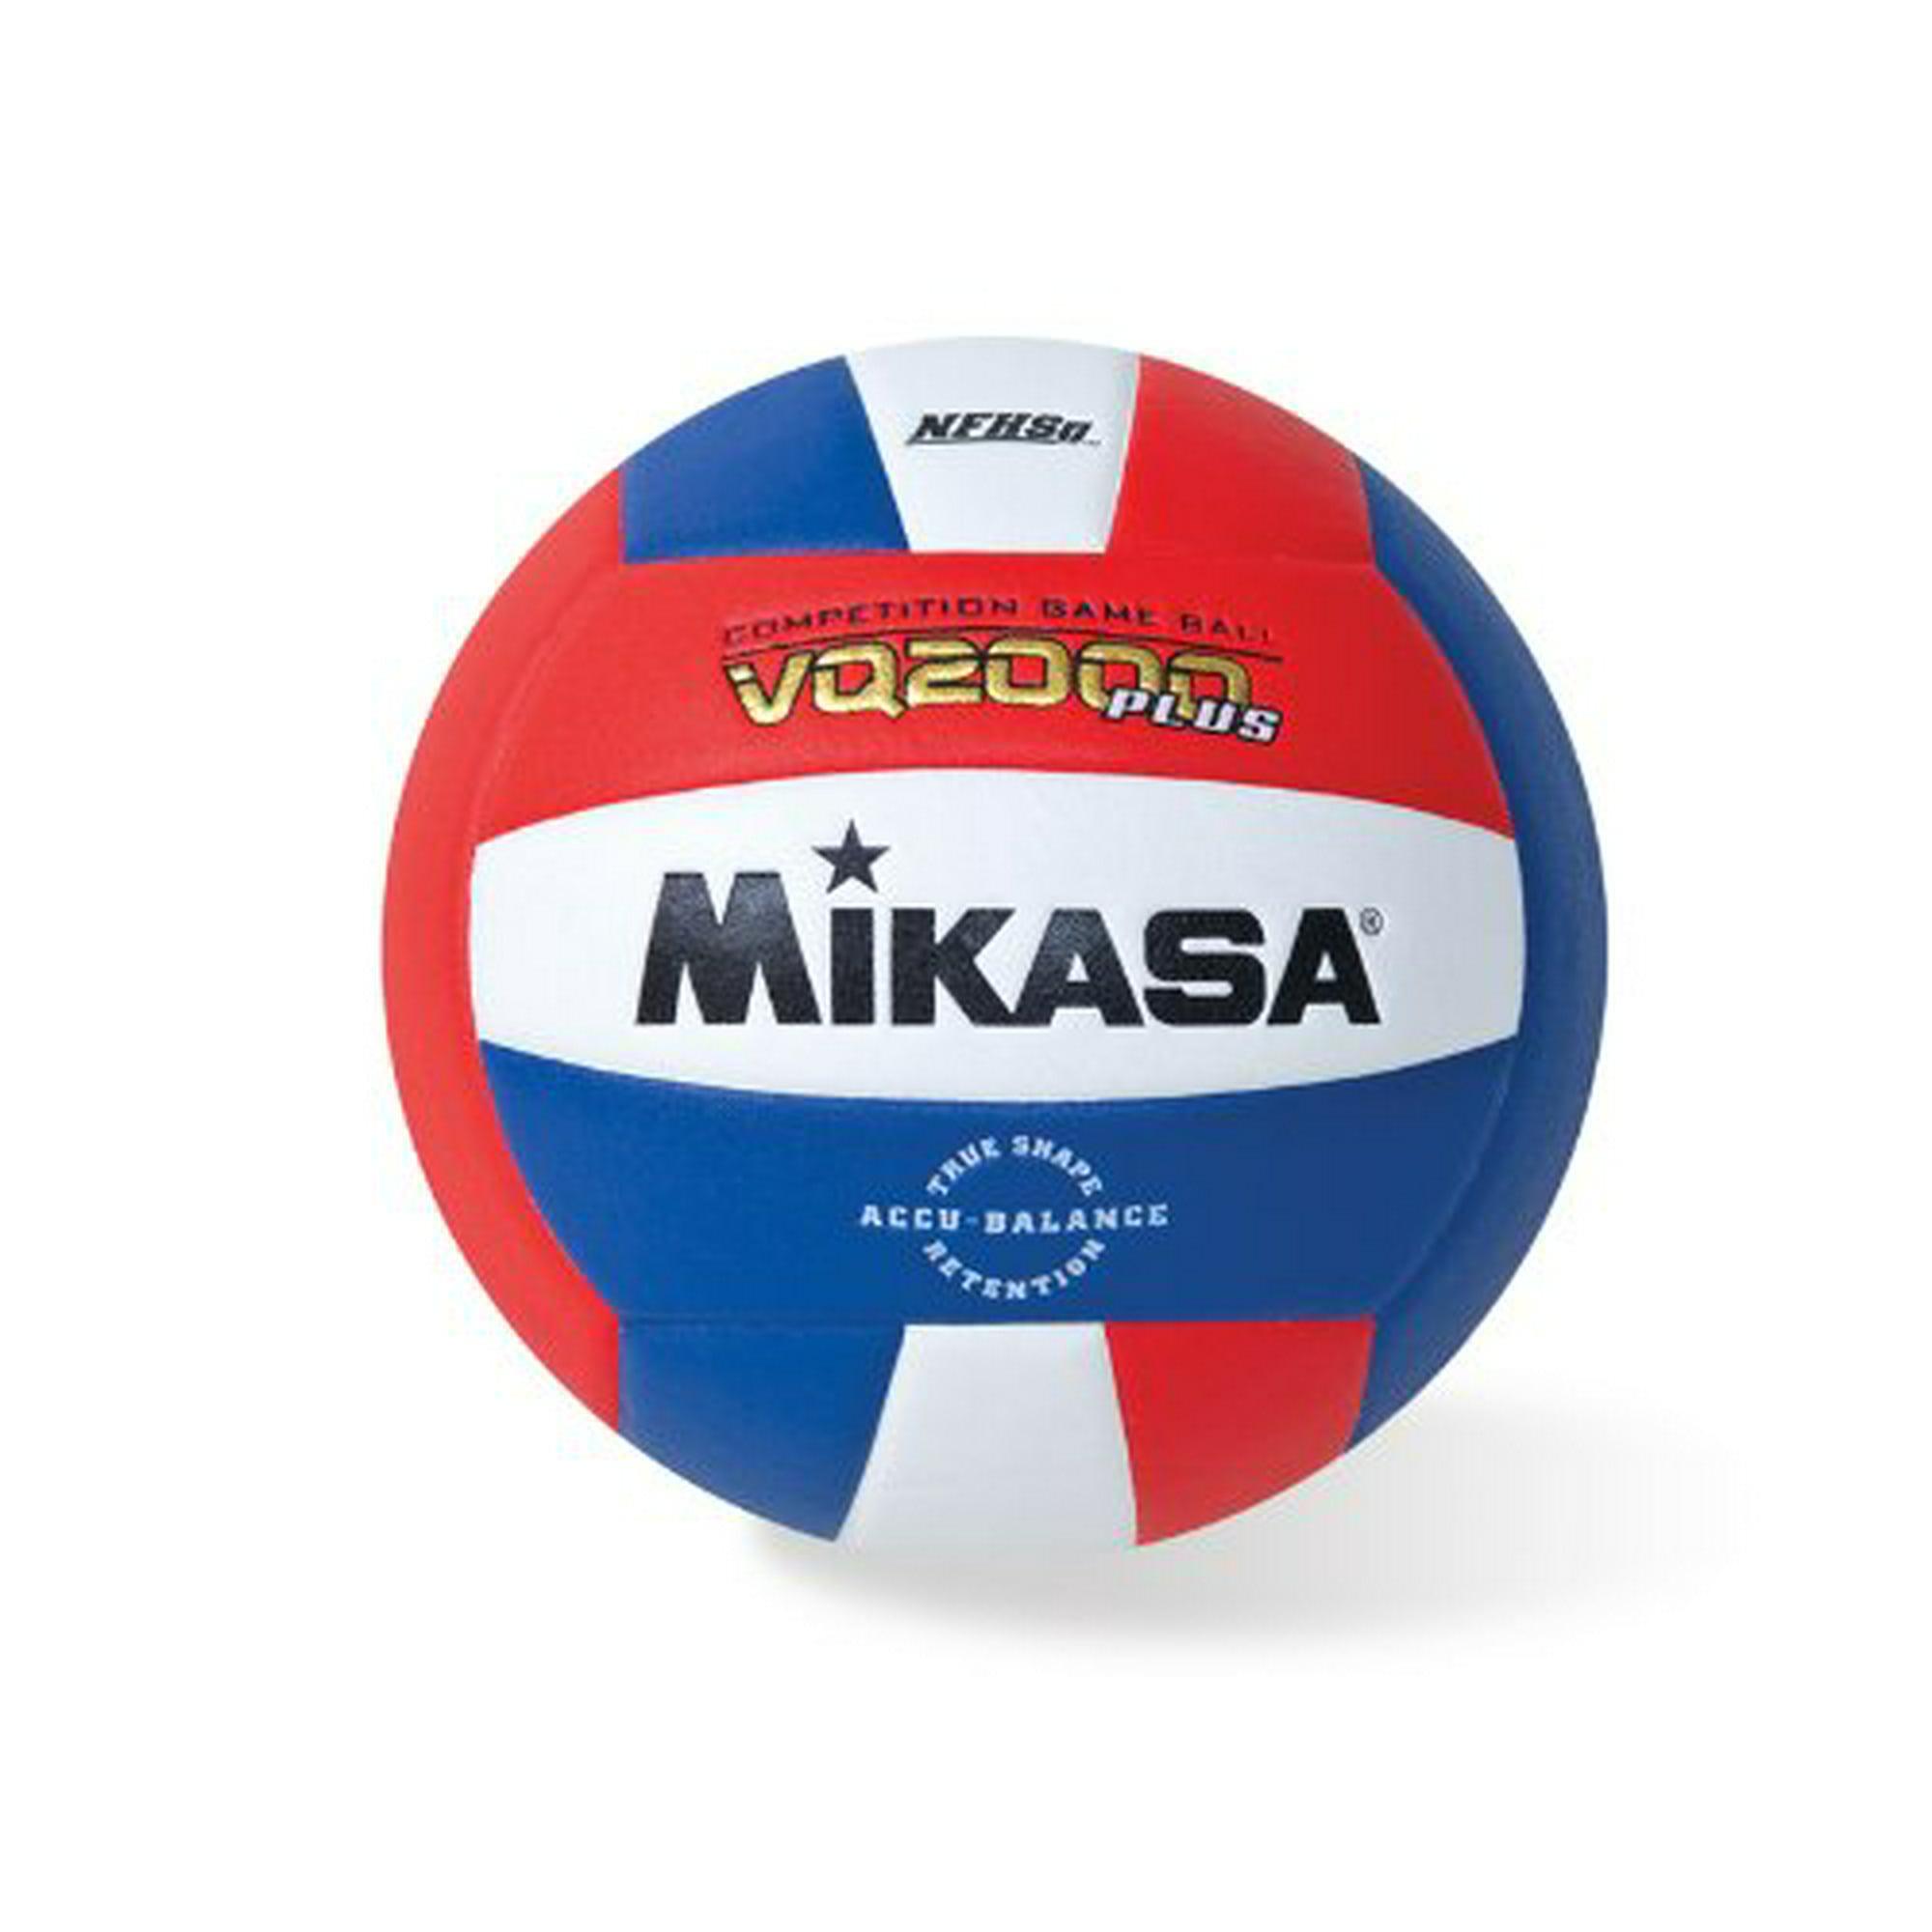 Mikasa Vq2000 Micro Cell Volleyball Red White Blue Walmart Canada